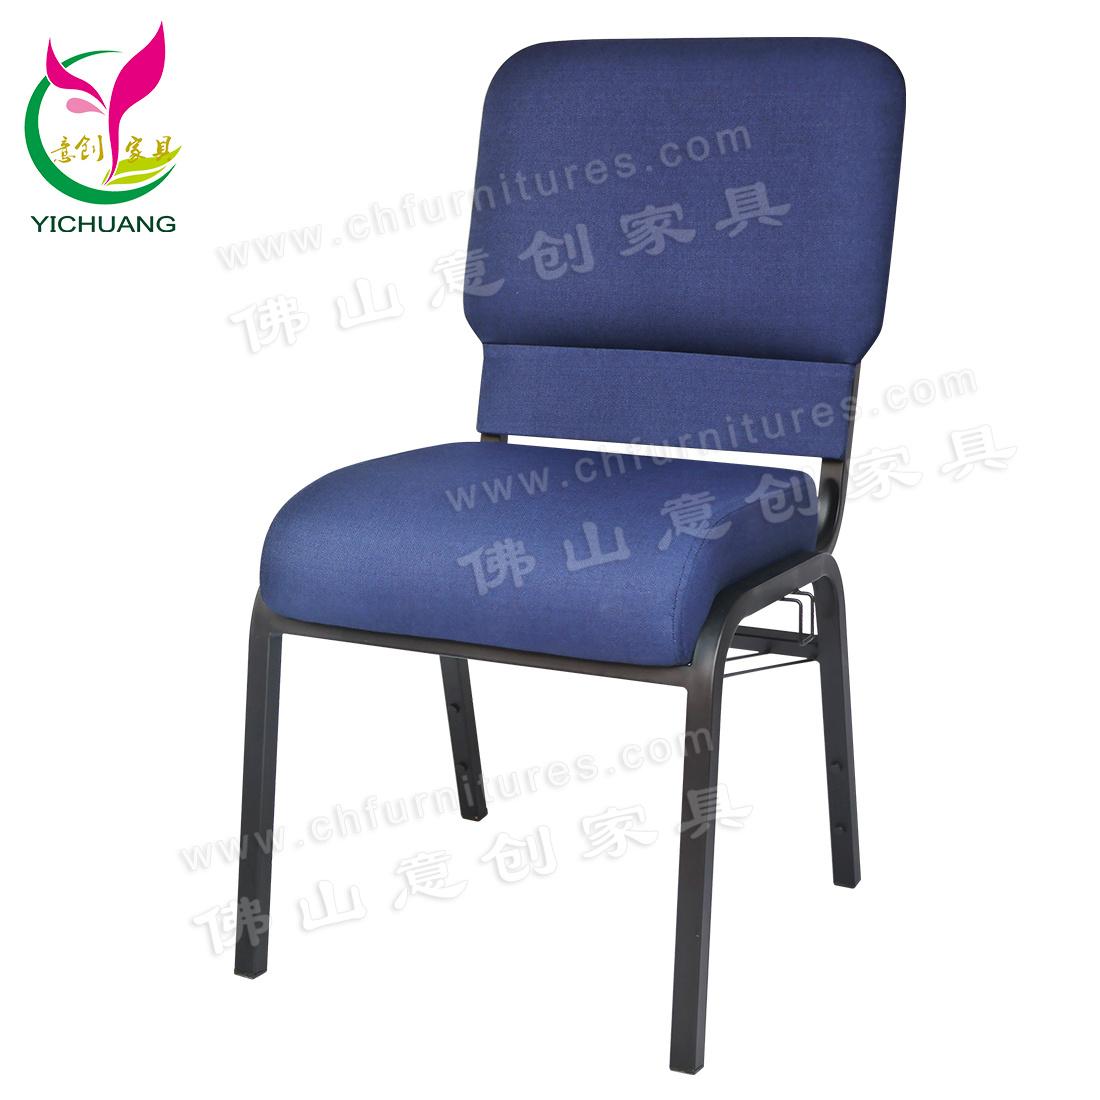 Hot Item Yc G36 07 Wholesale Black Frame Stackable Elegant Blue Upholstered Chair For Church